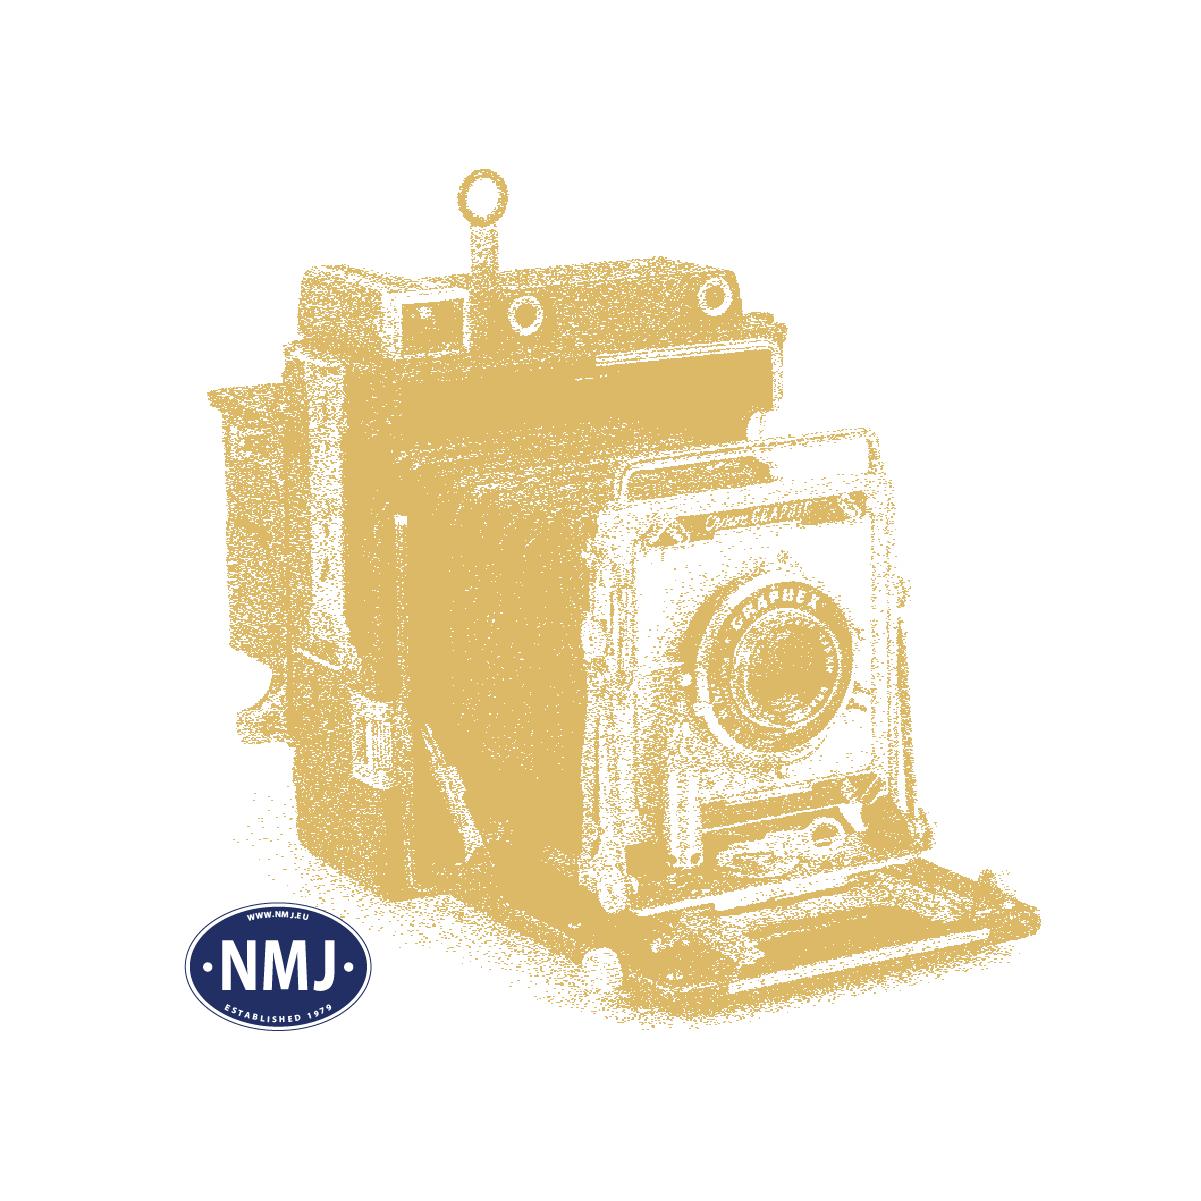 NMJT81.104 - NMJ Topline GMB BM71.009, DC